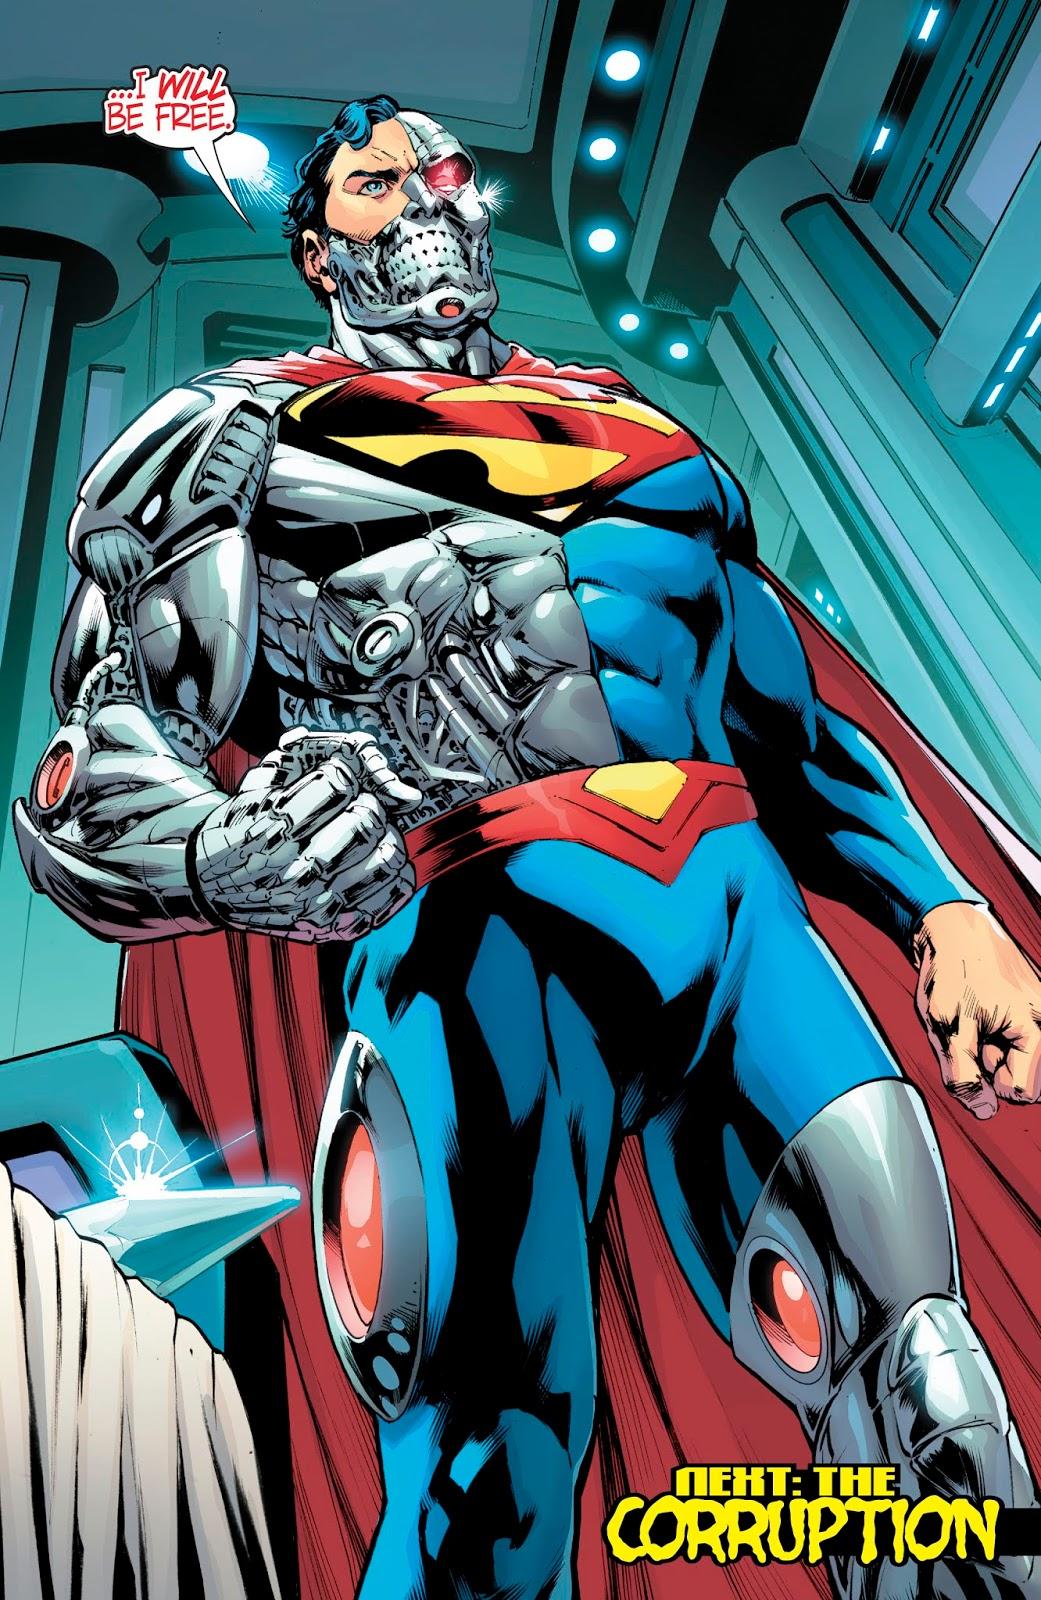 Cyborg-Superman (Green Lanterns Vol. 1 #53)